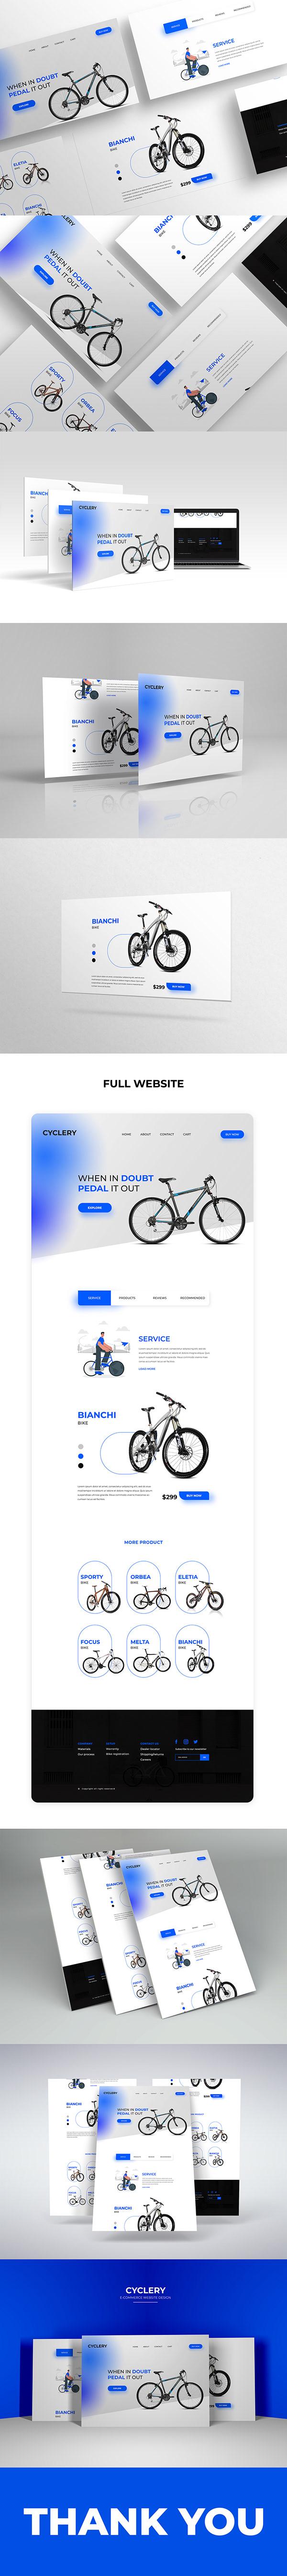 CYCLERY - Website Design